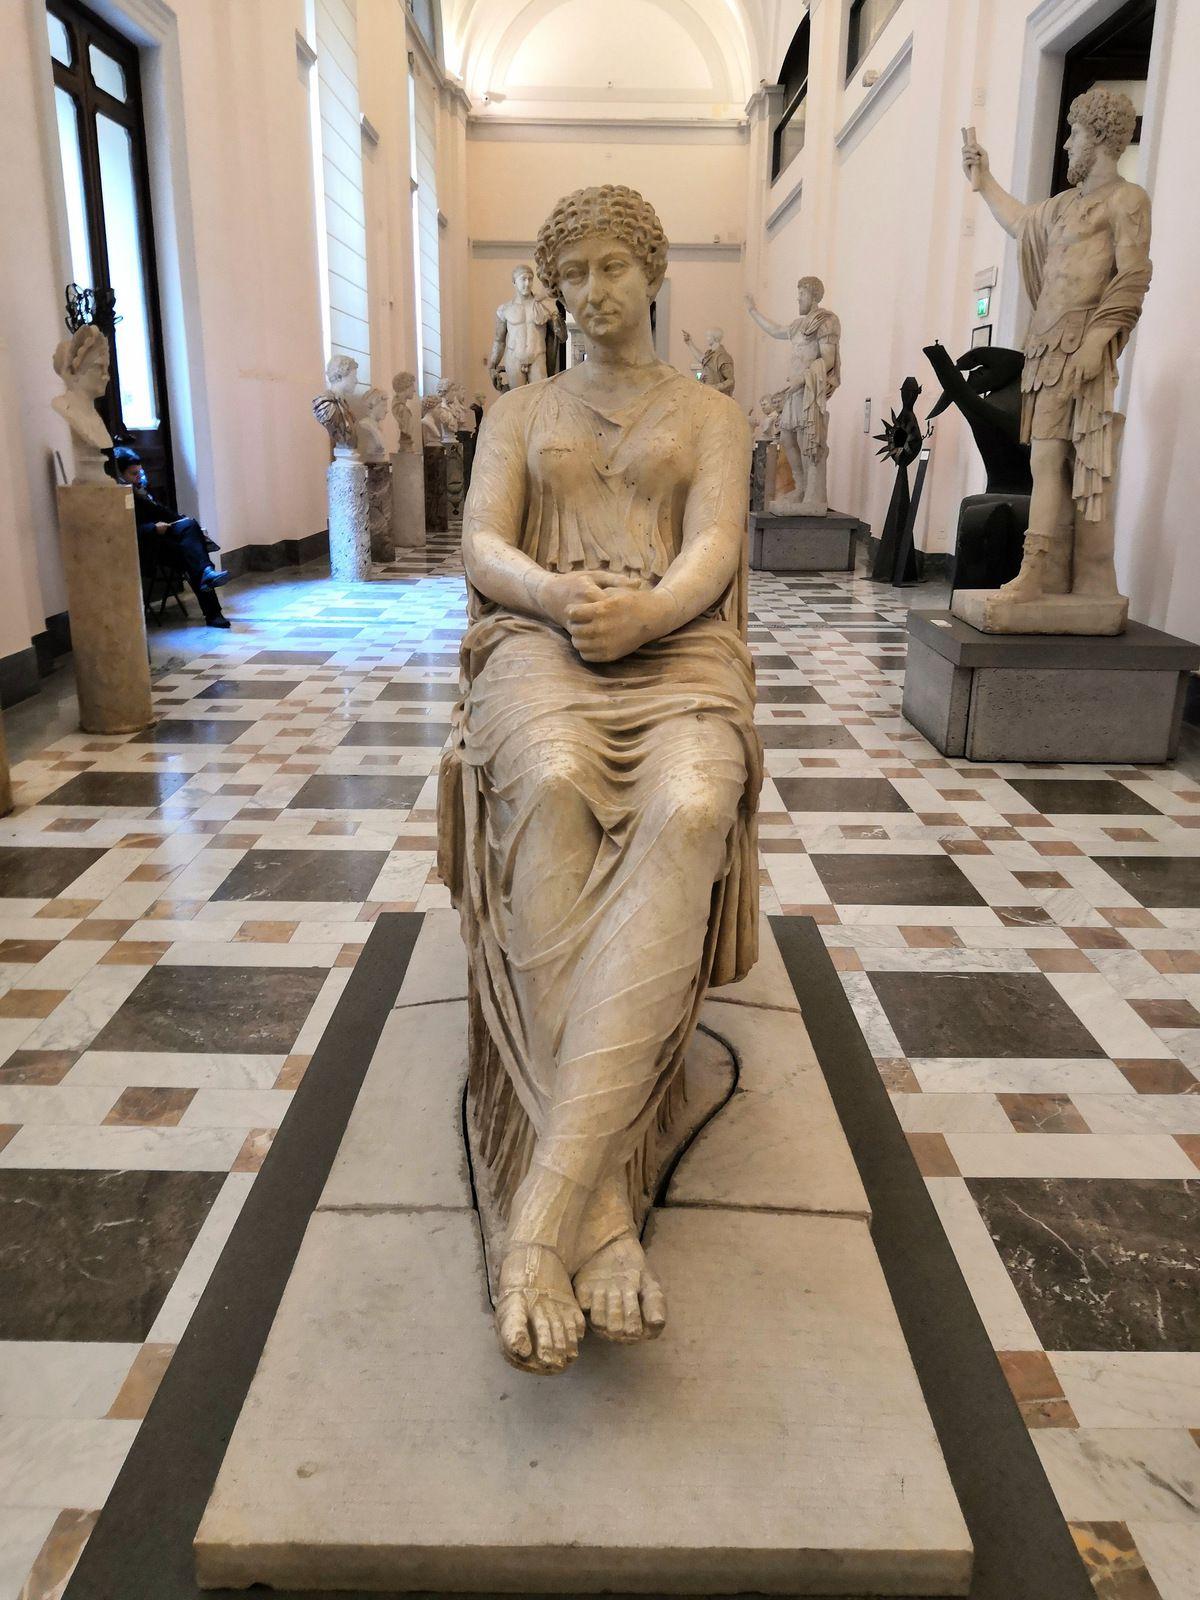 cd. Agrippina [The so-called Aggripina], Neroniamo-Flavia (seconda metà I sec. d.C.)